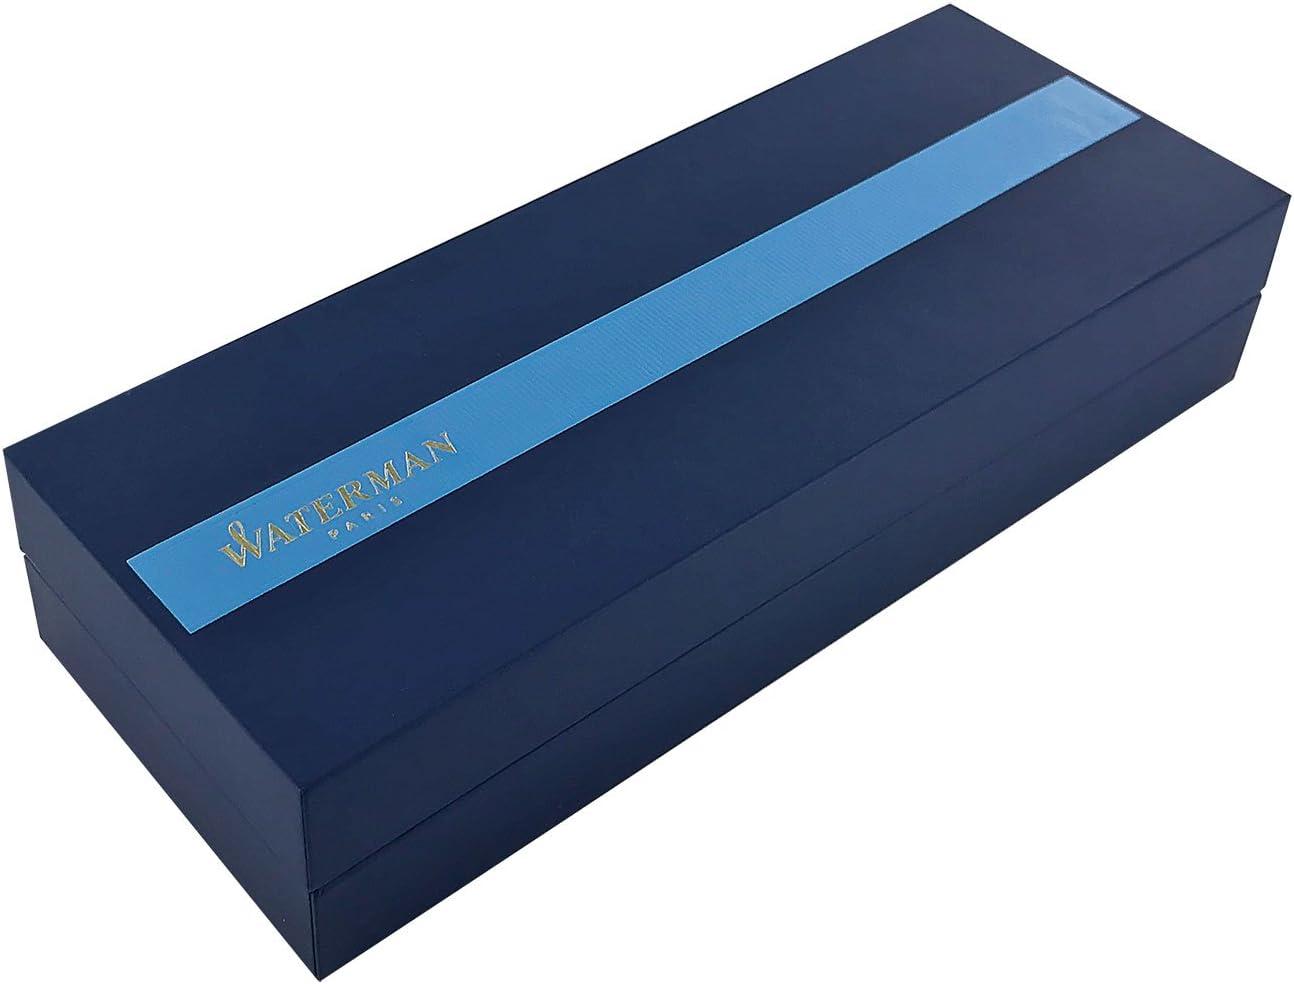 Waterman Empty Presentation Pen Pencil Blue Gift Box New Version